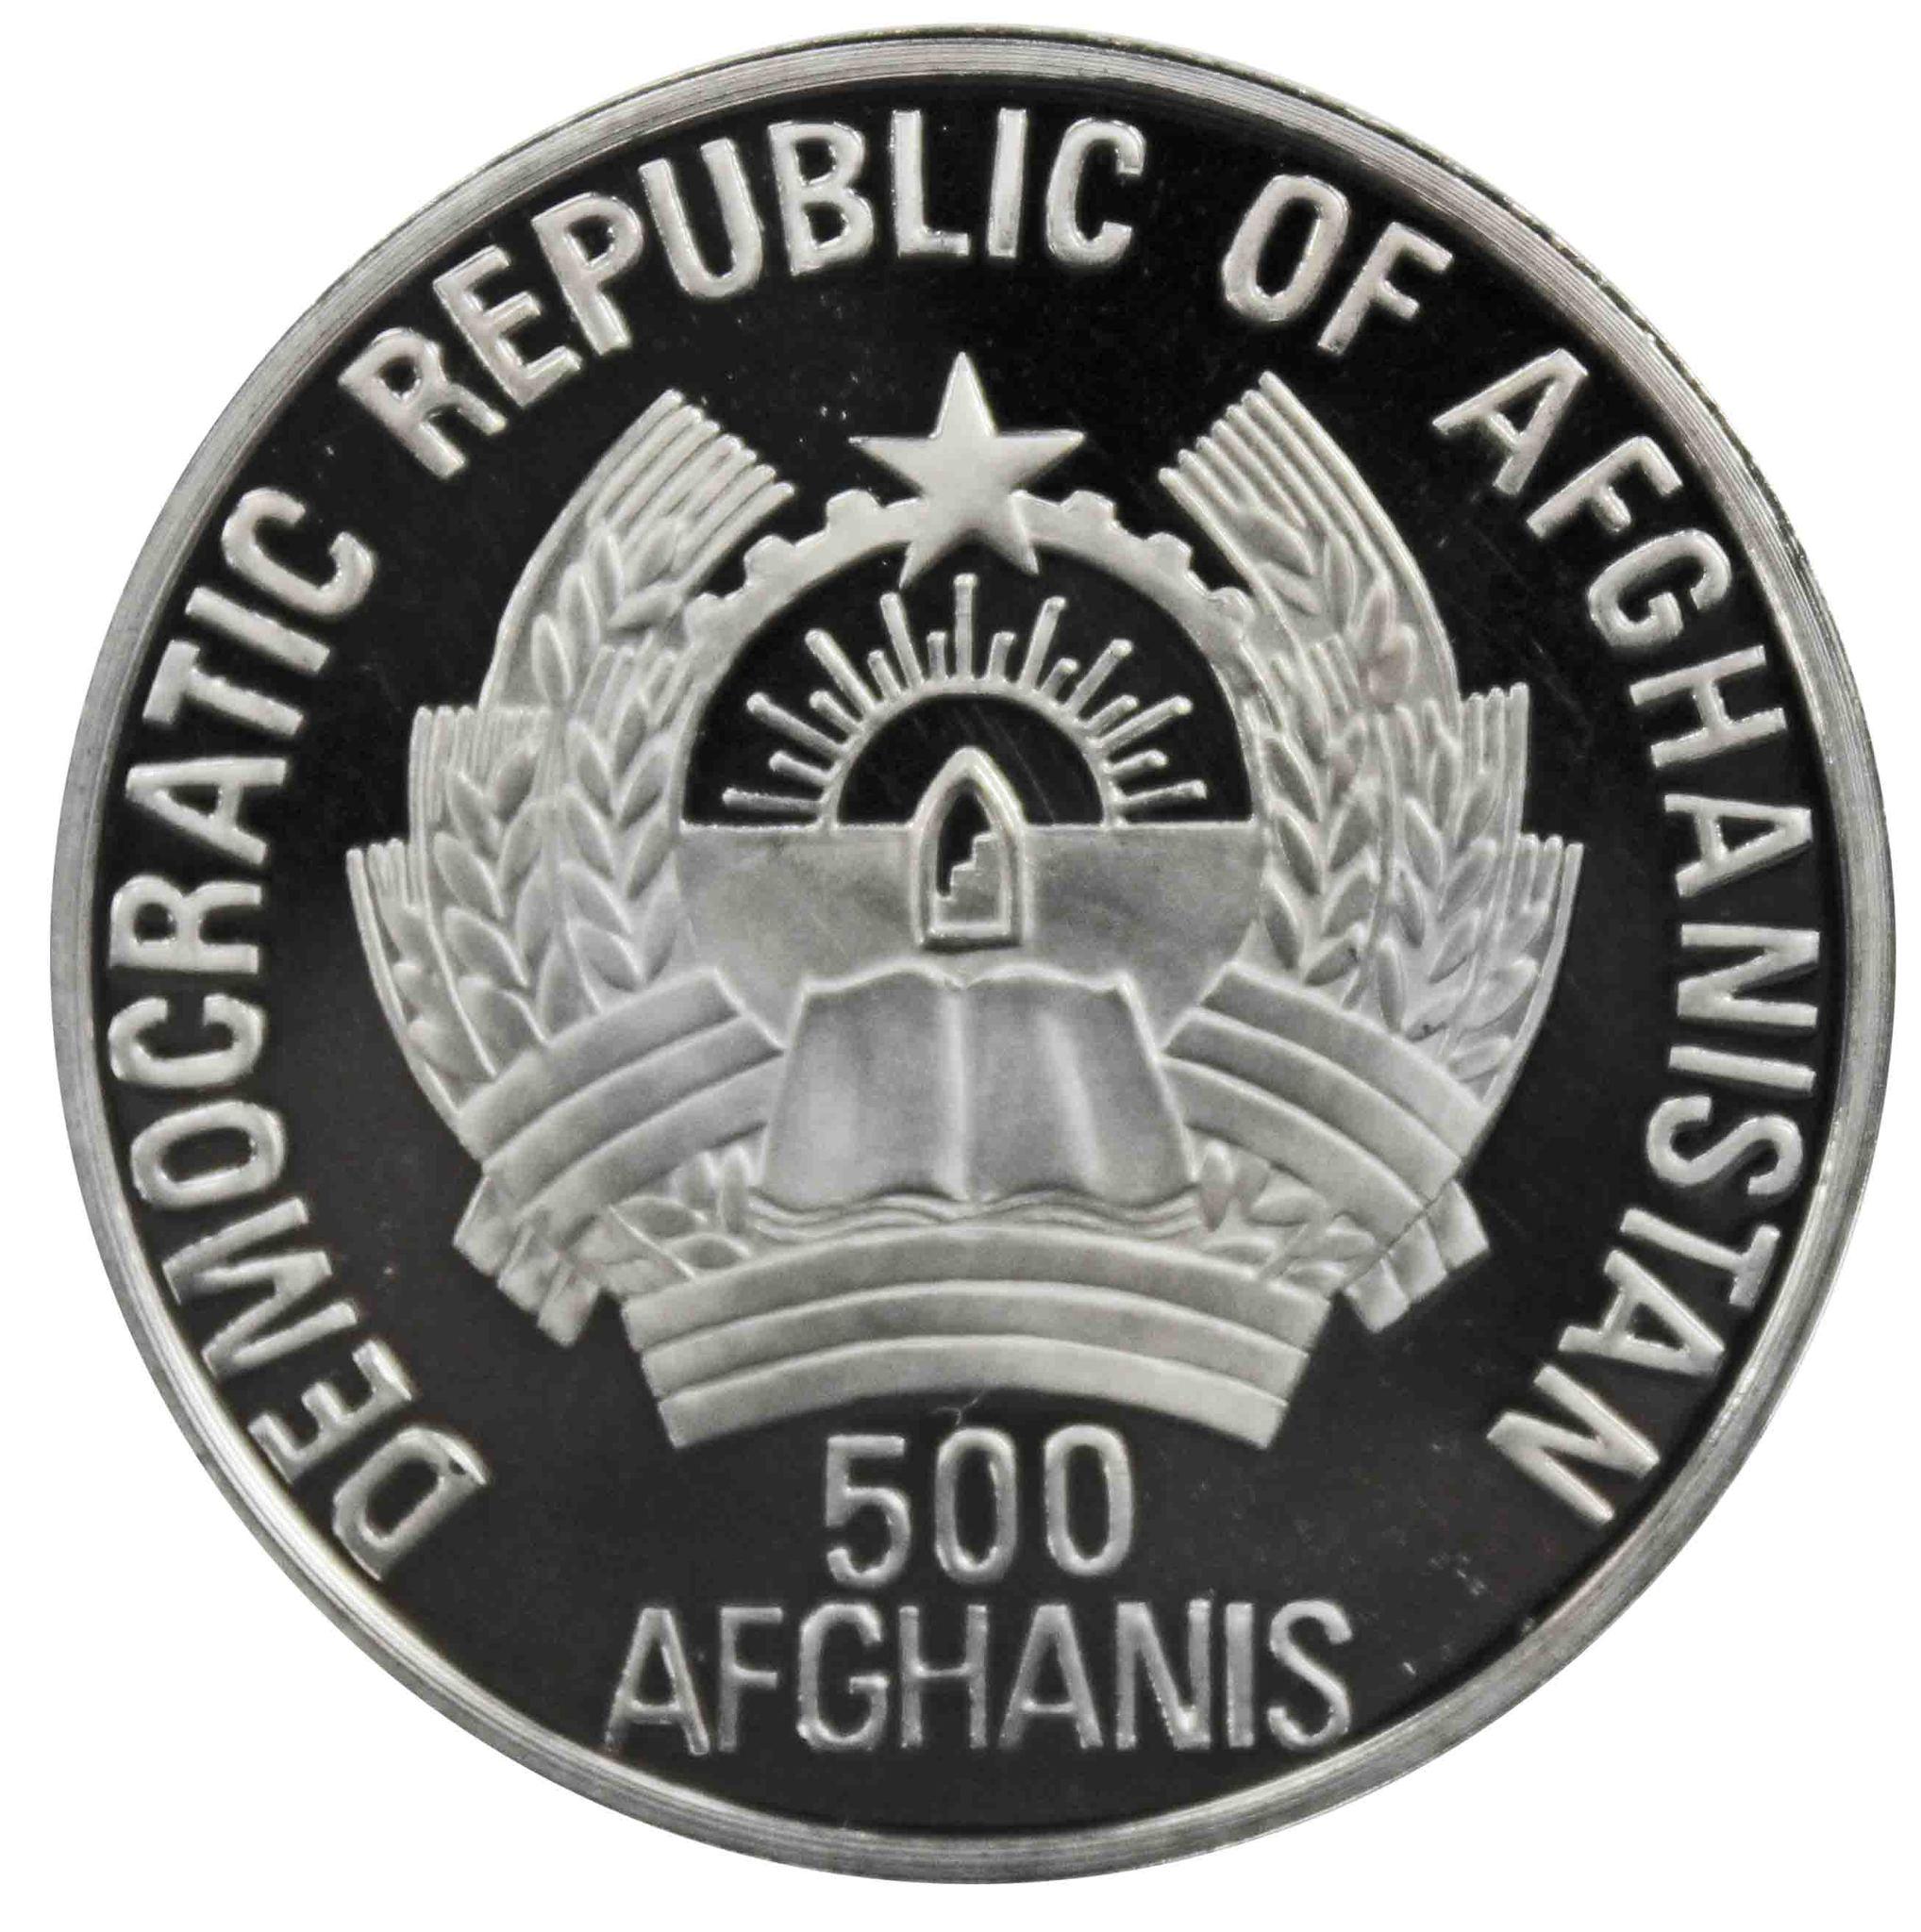 500 афгани Чемпионат мира по футболу 1990 года. Афганистан. 1989 год. Серебро. PROOF